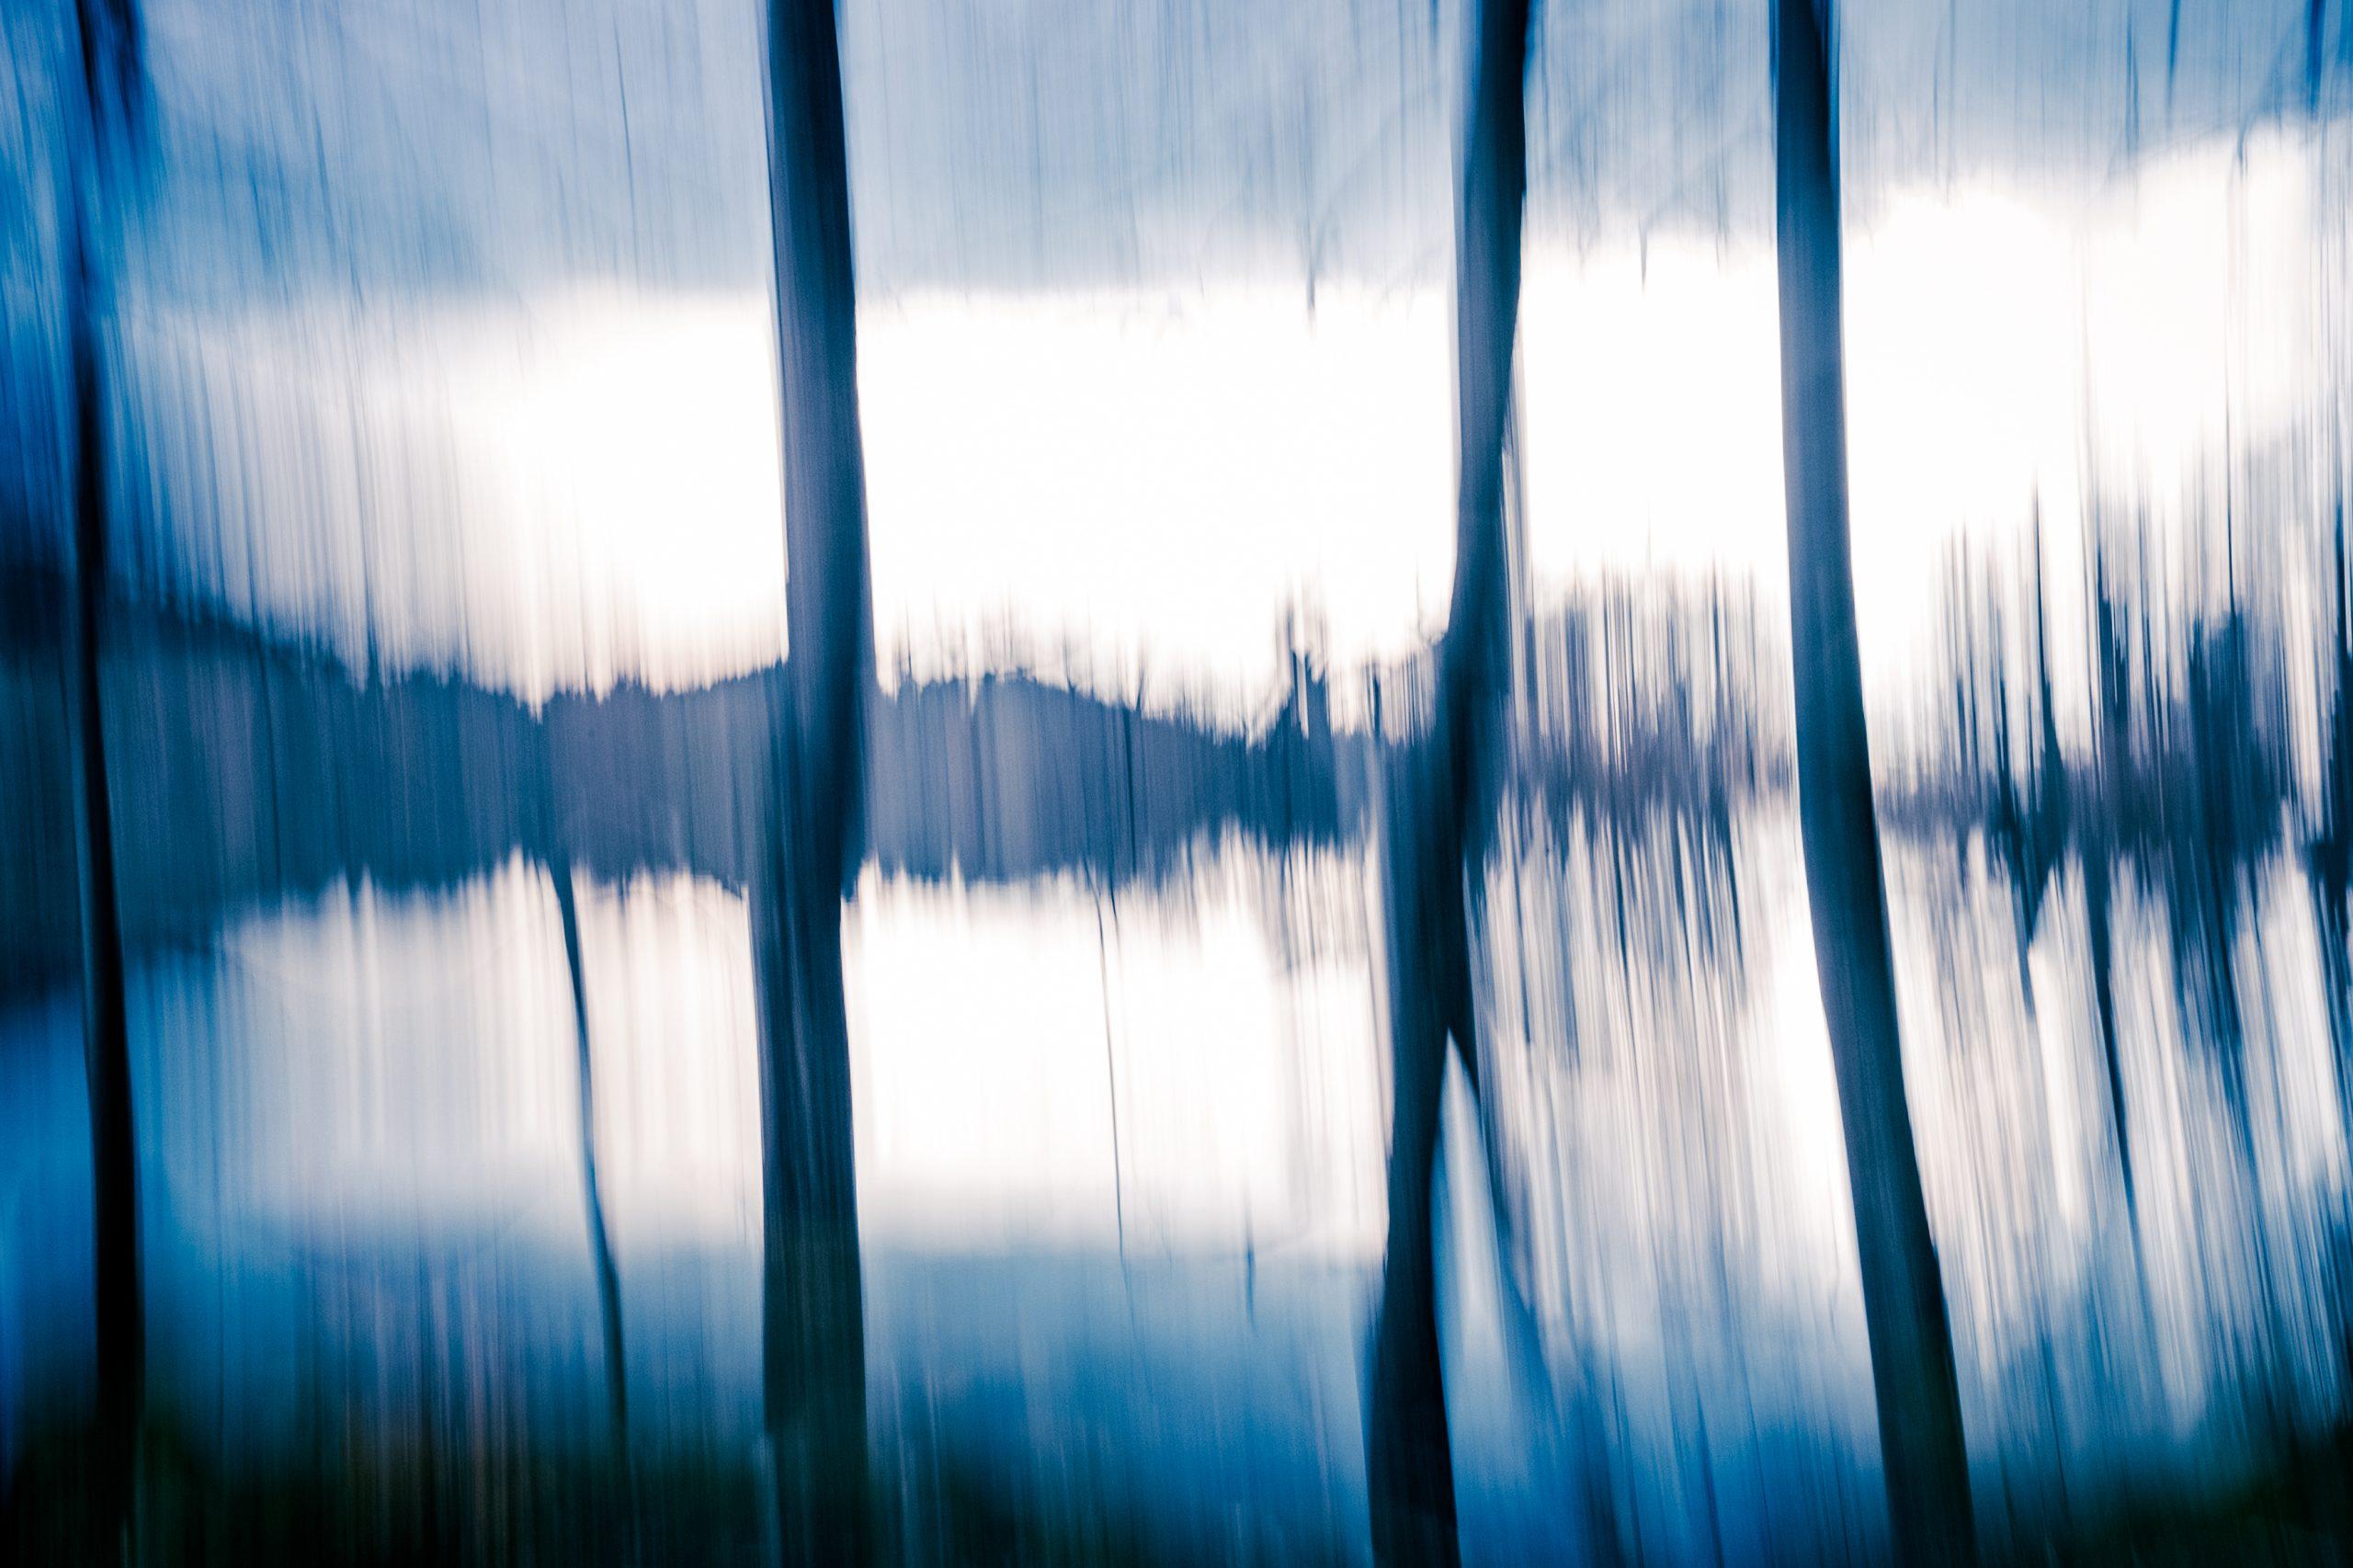 BL_Sound_Of_Silence_Sebastian_Krawczyk